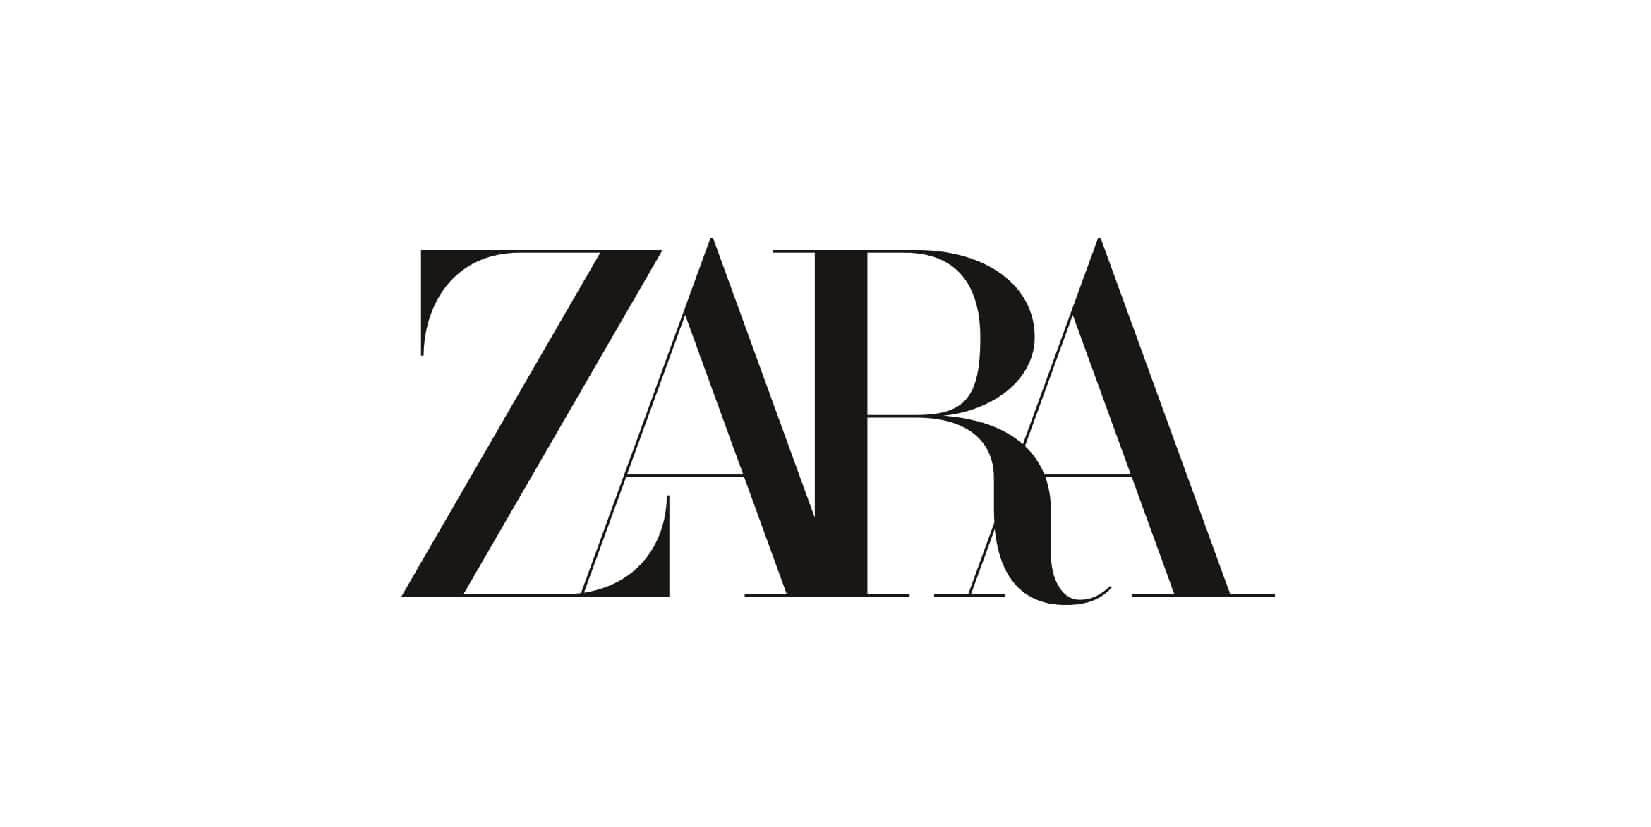 ZARA macau jobscall.me recruitment ad 澳門招聘-01-3.jpg